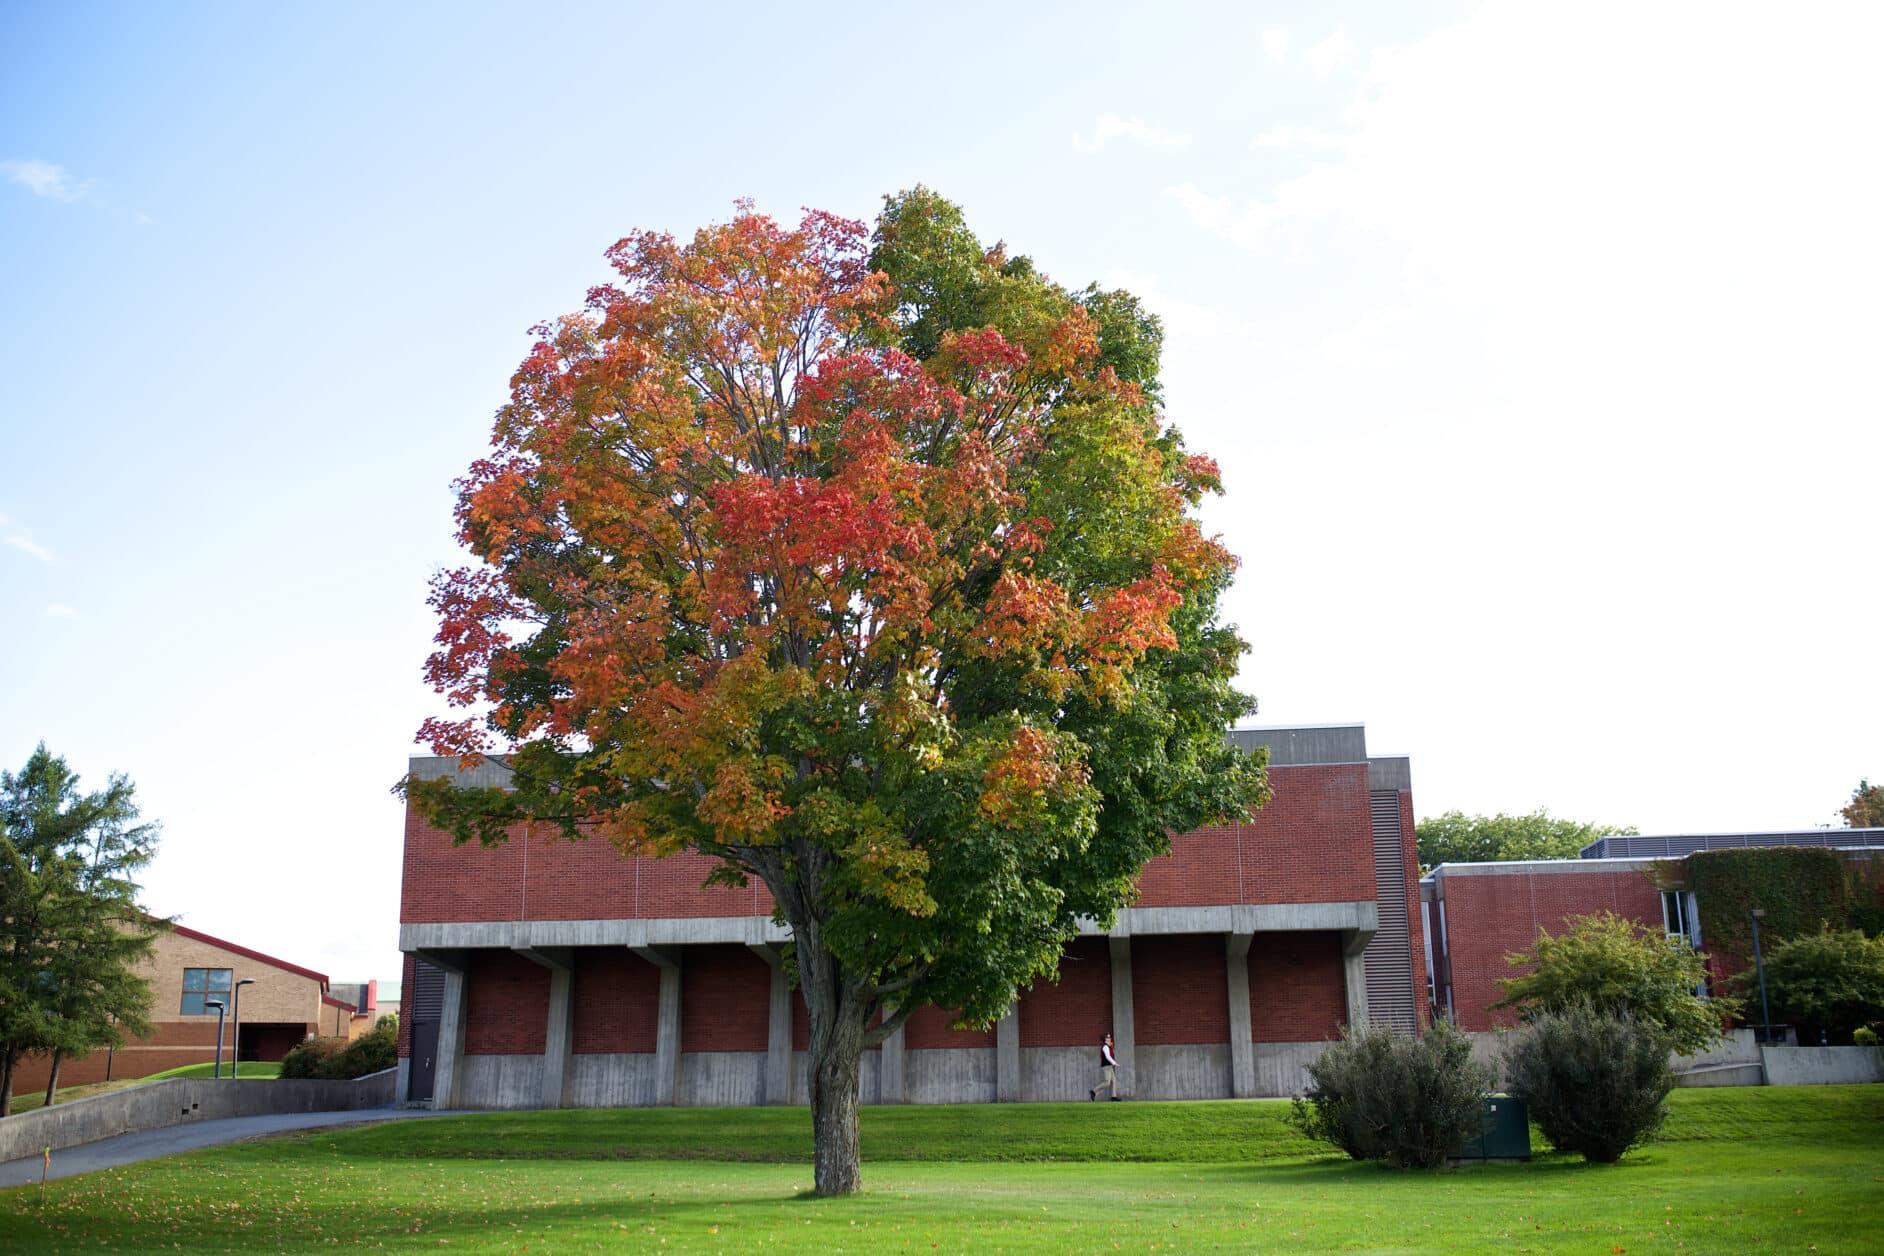 Colorful fall tree, autumn, Randolph Center campus